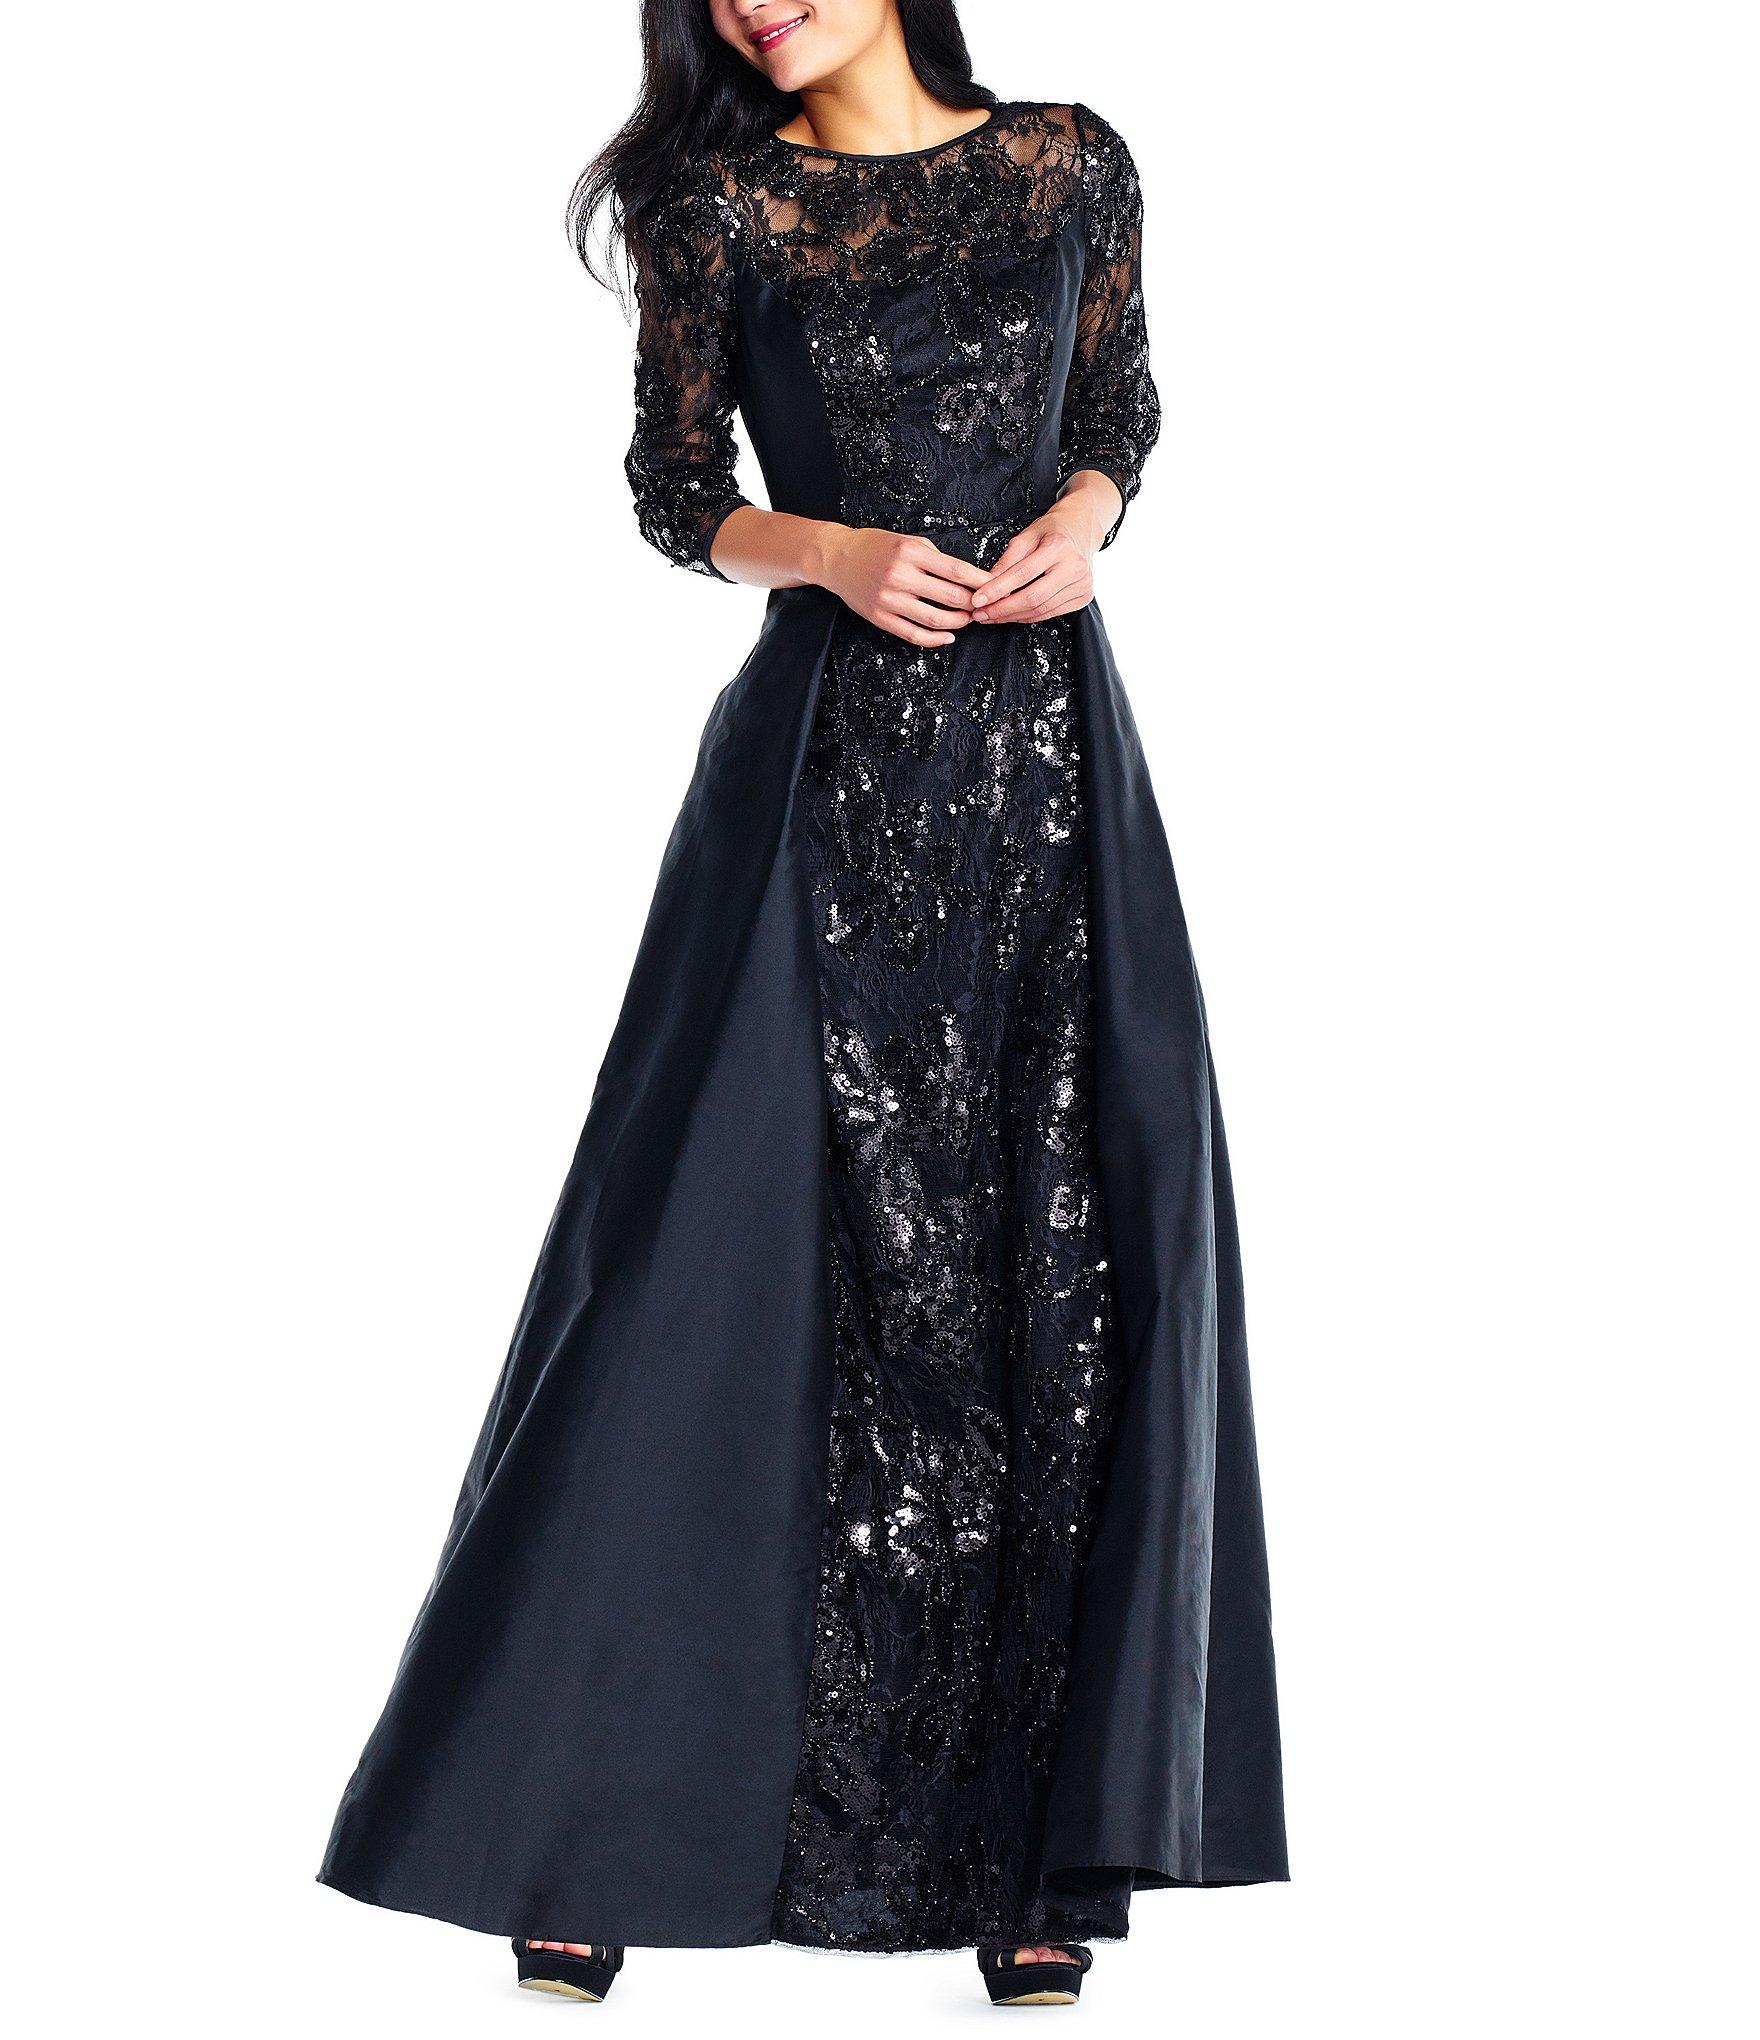 Adrianna Papell Sequined Taffeta Gown Dillards